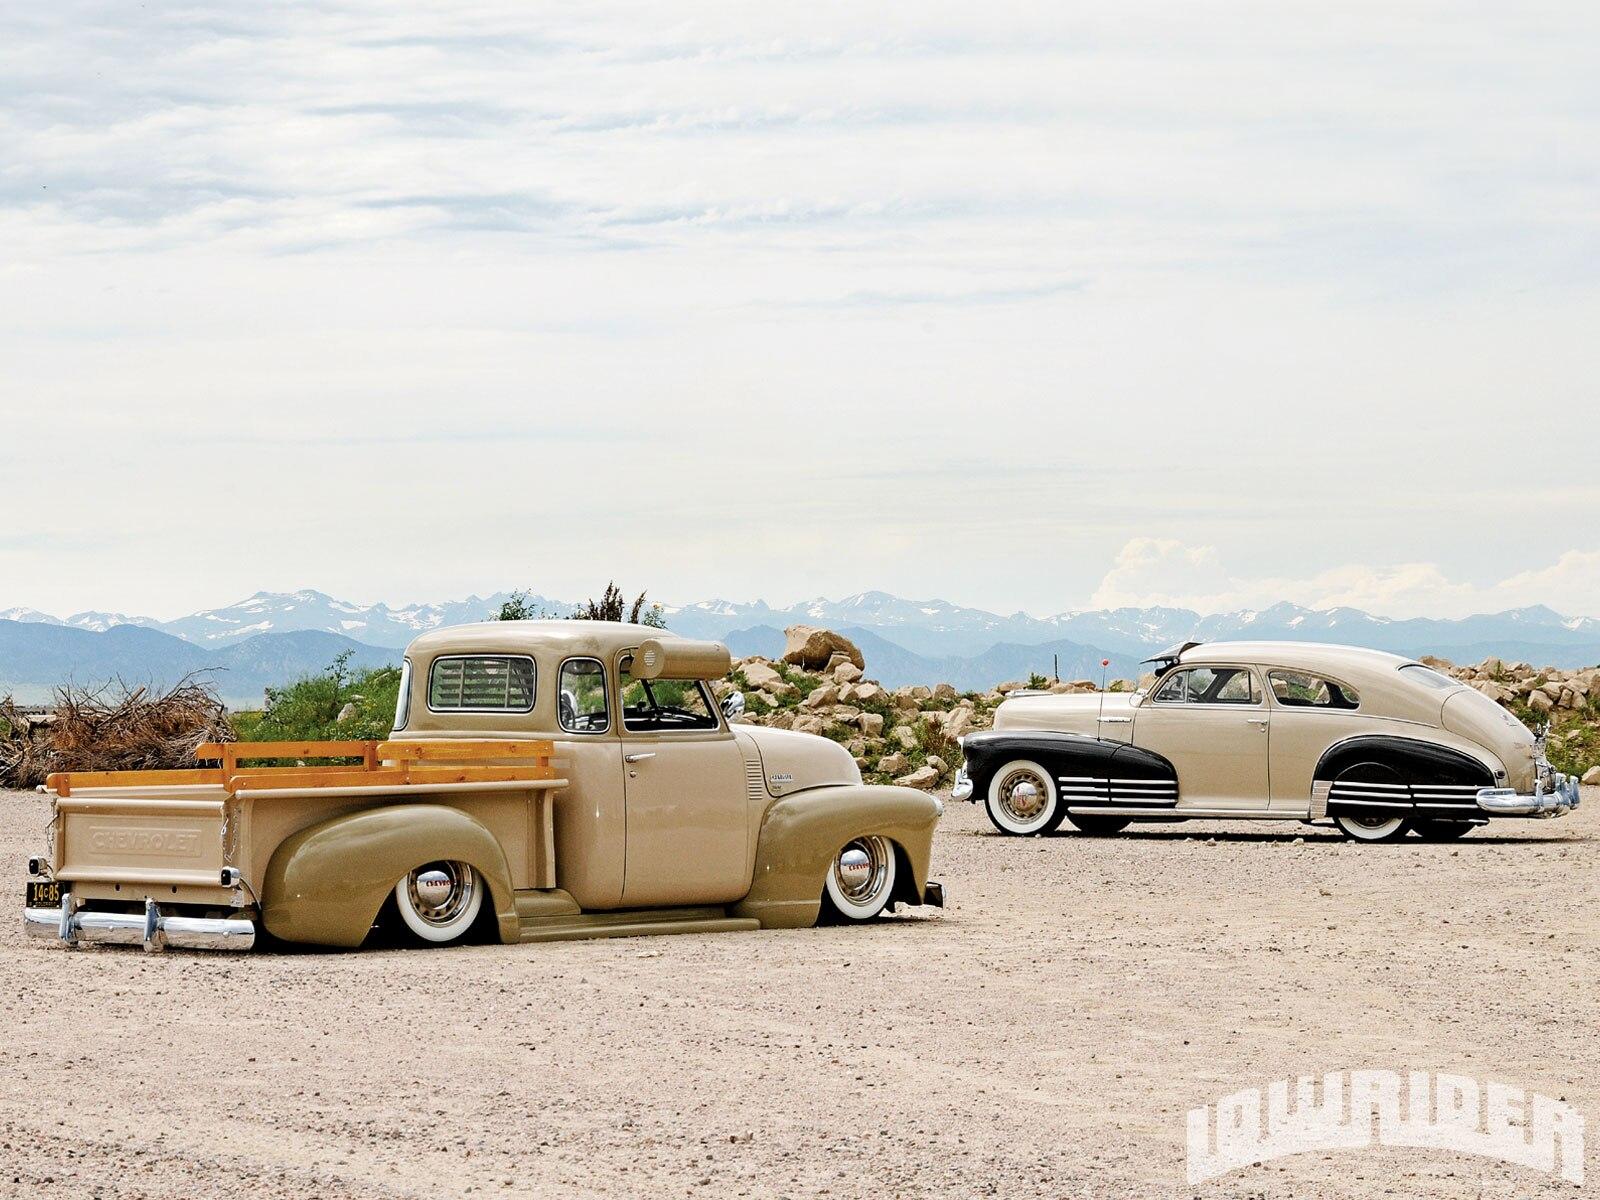 1001_lrmp_02_o-1949_chevrolet_3100_pickup_1947_fleetline-cars3